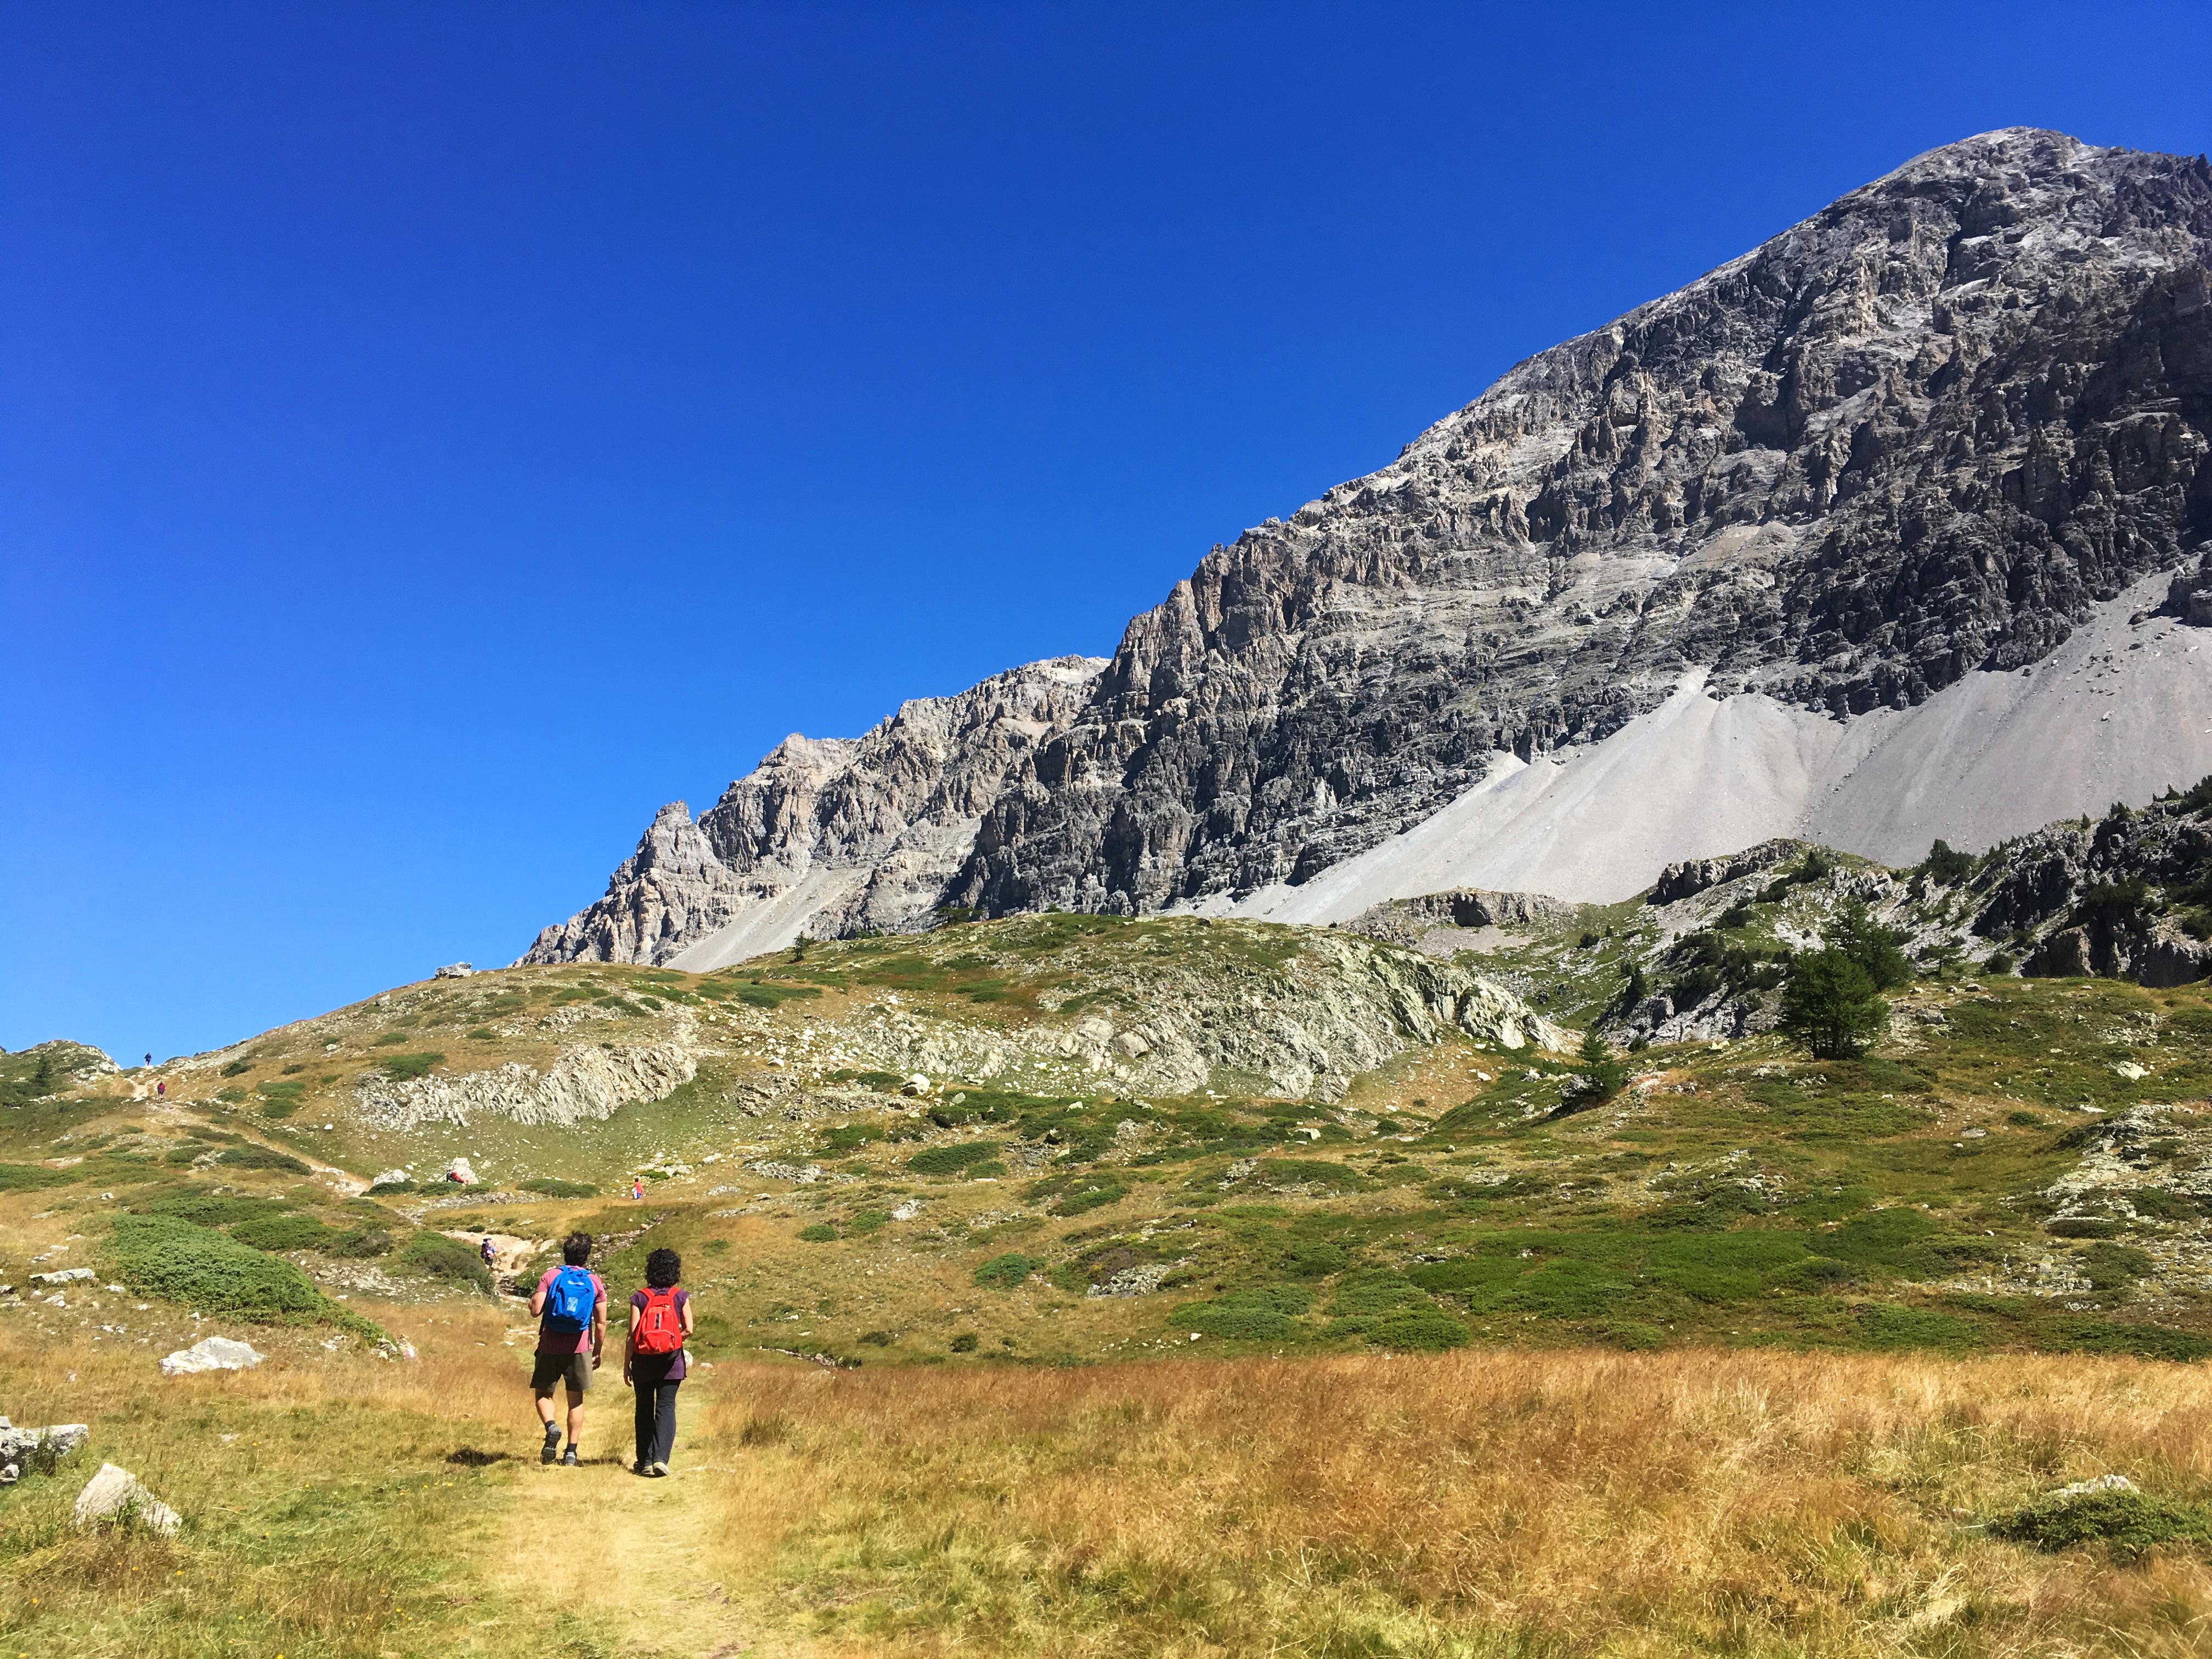 Couple walking towards the mountain